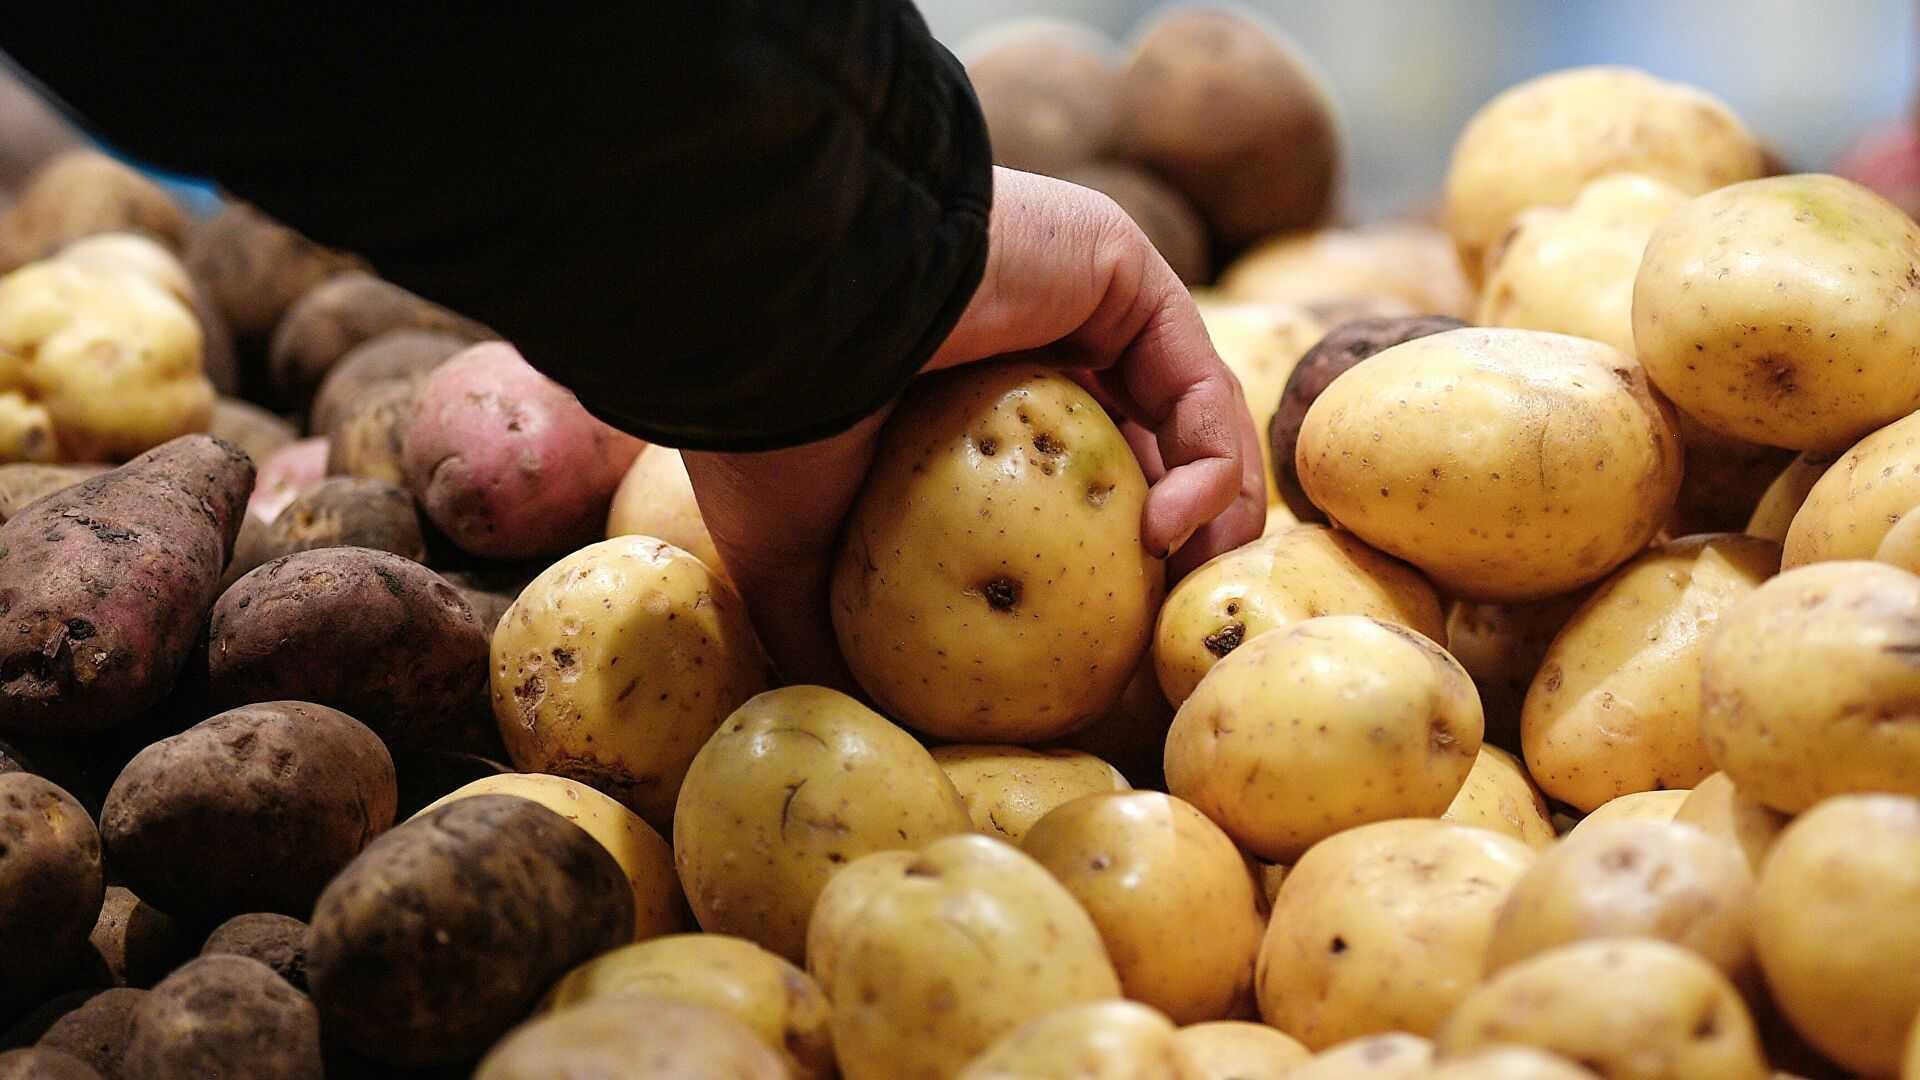 Эксперты объяснили резкий рост цен на мясо и овощи